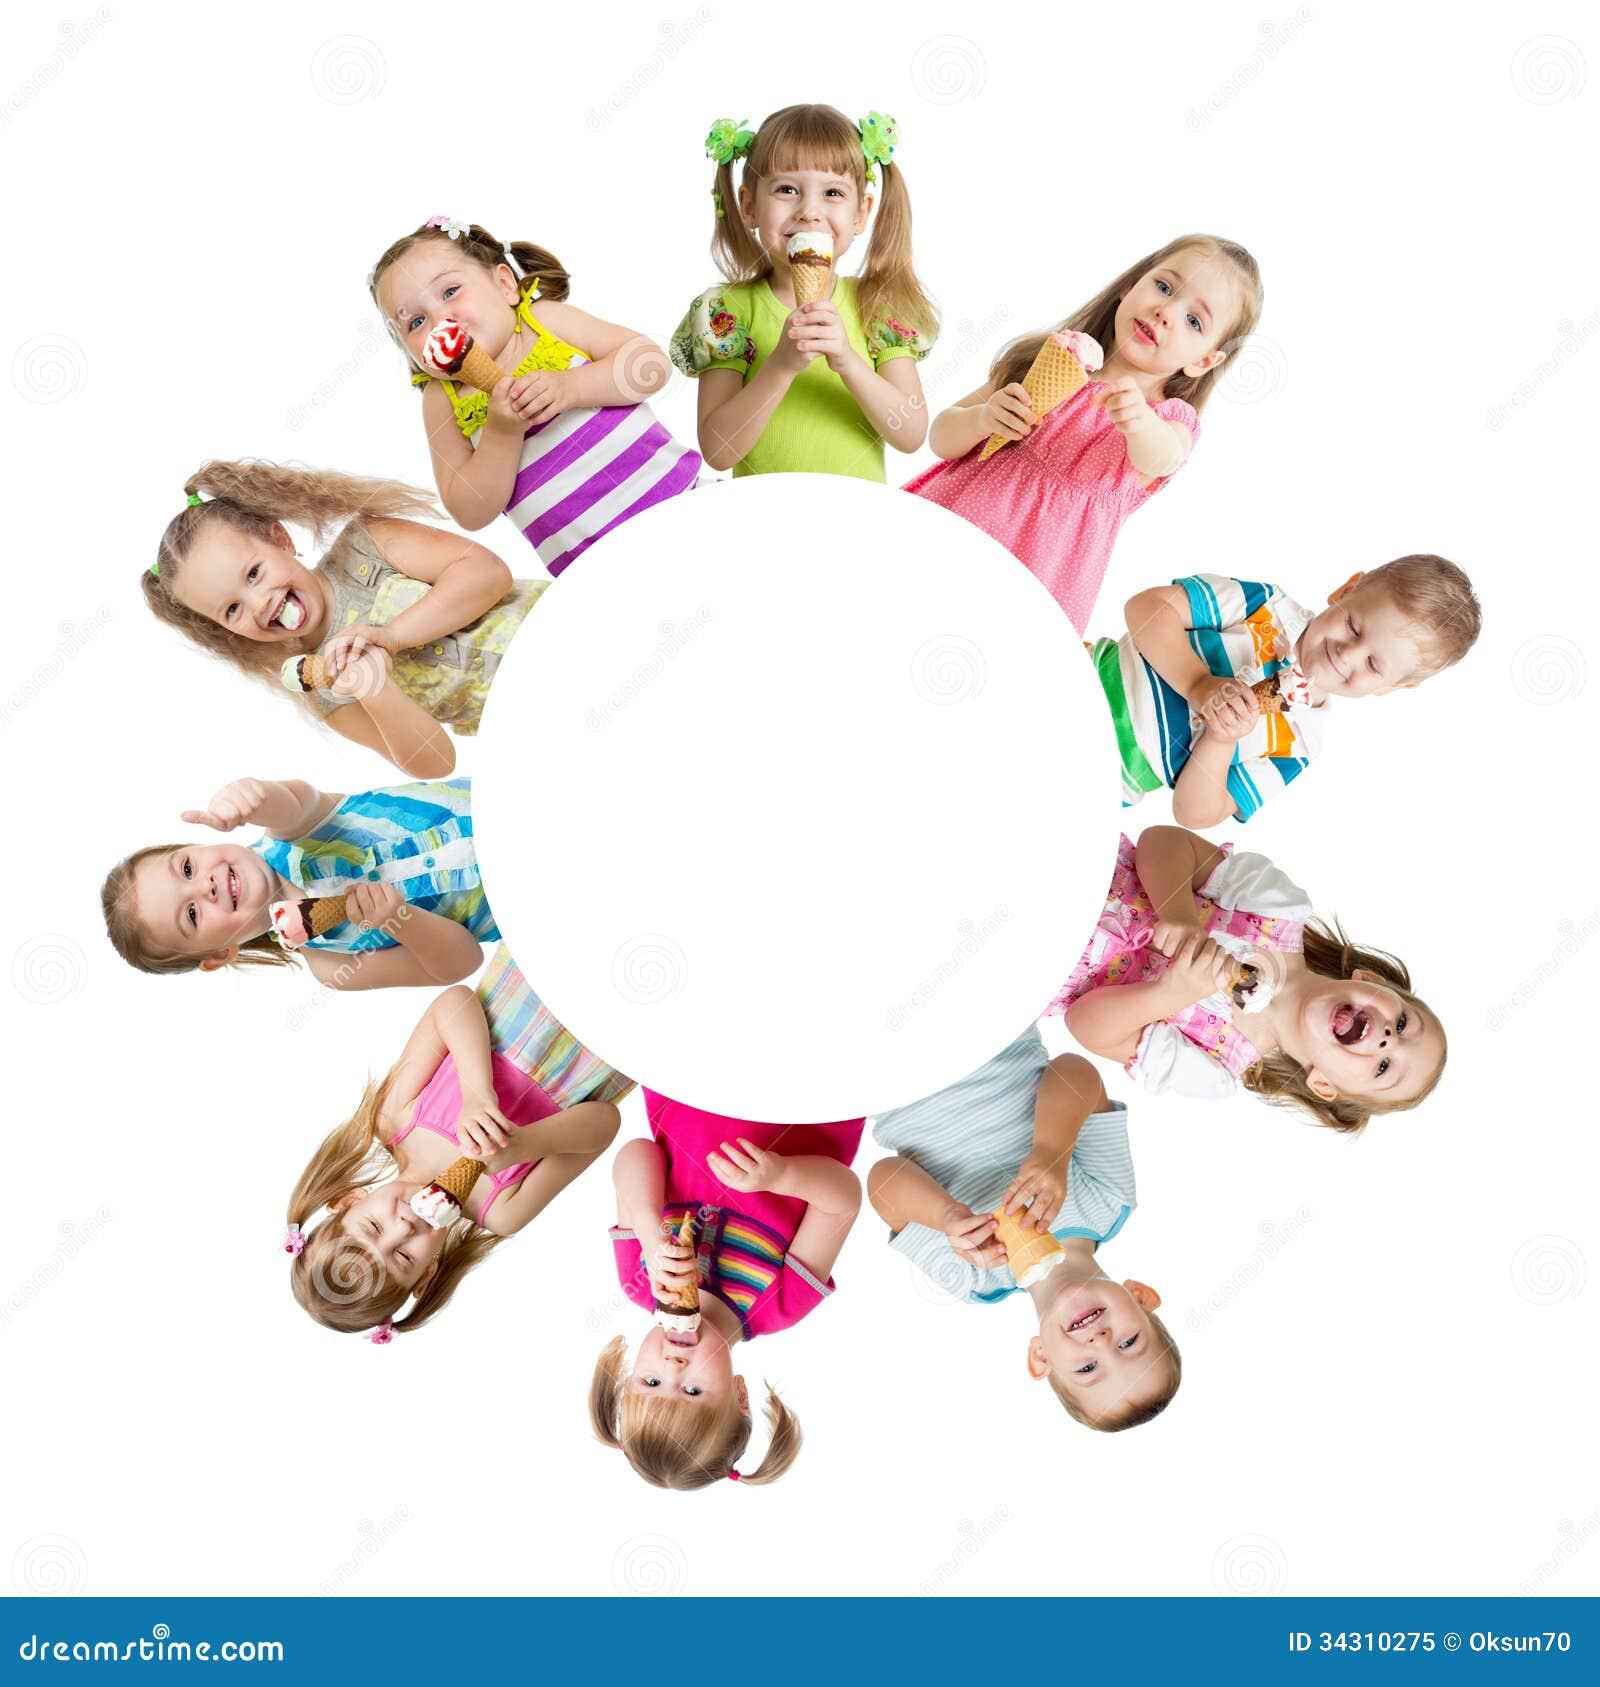 Grupp av ungar eller barn som äter glass